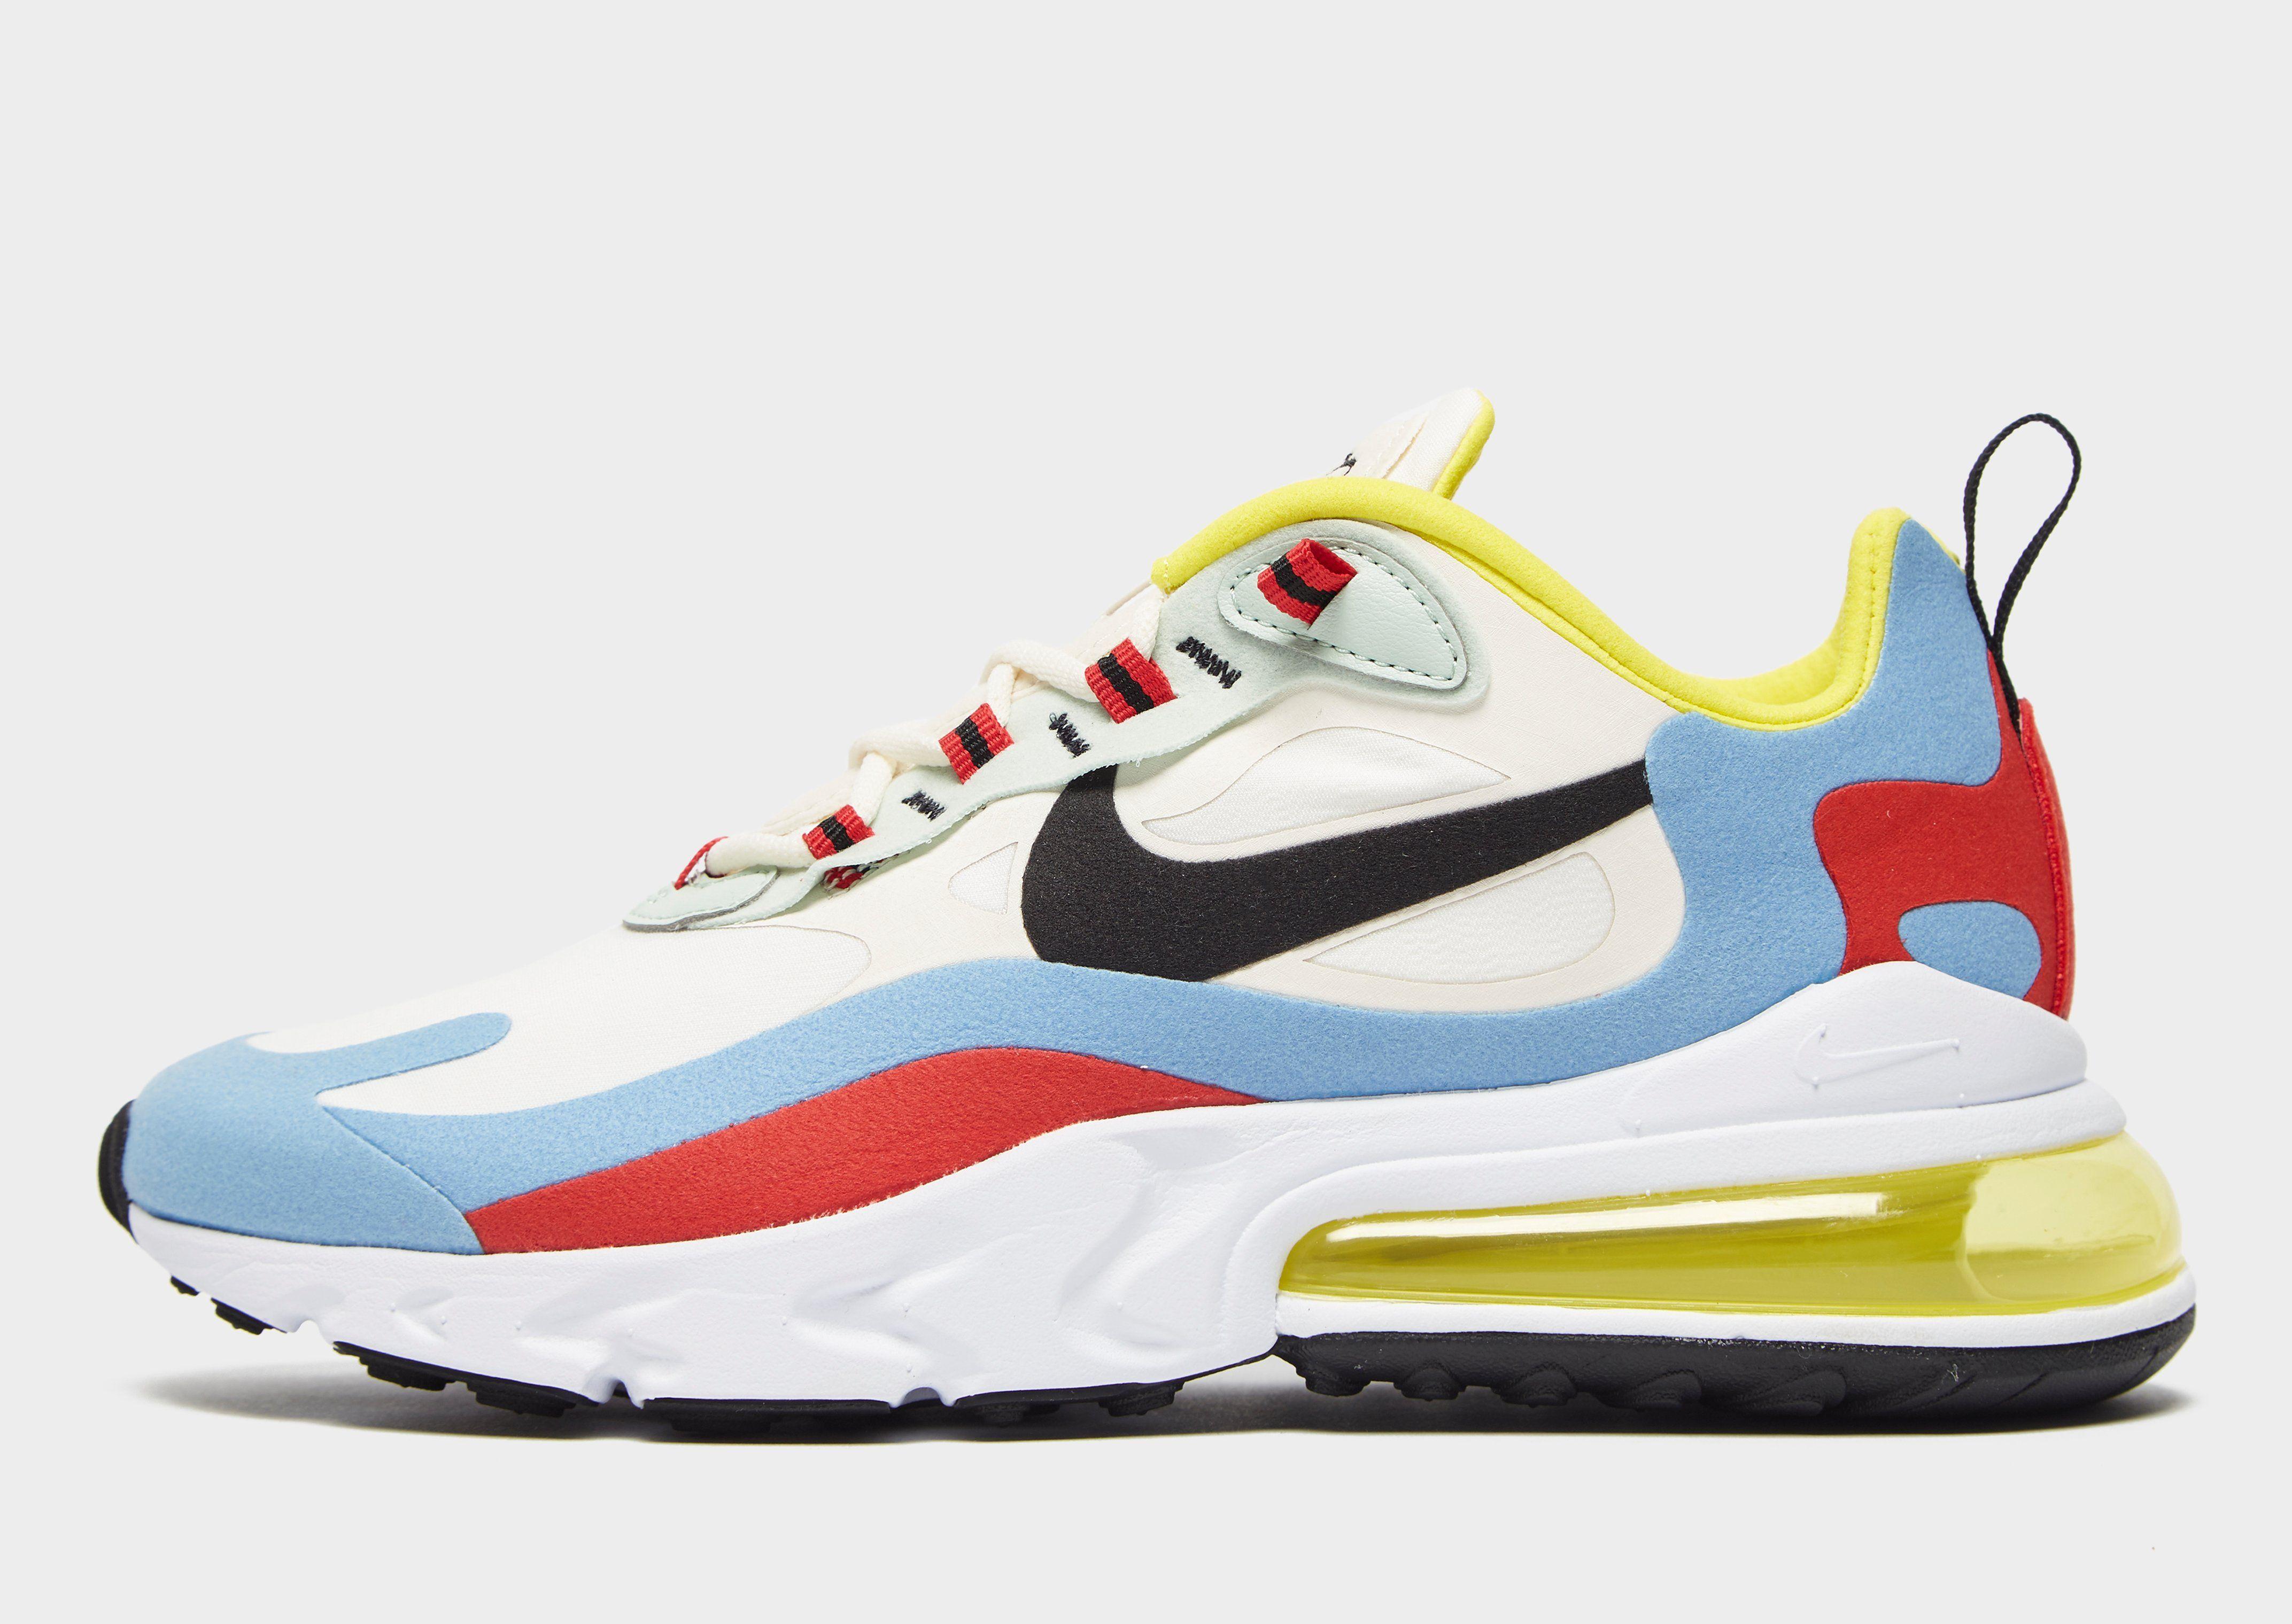 huge selection of 55f77 fad23 Nike Air Max 270 React (Optical) Women's Shoe | JD Sports